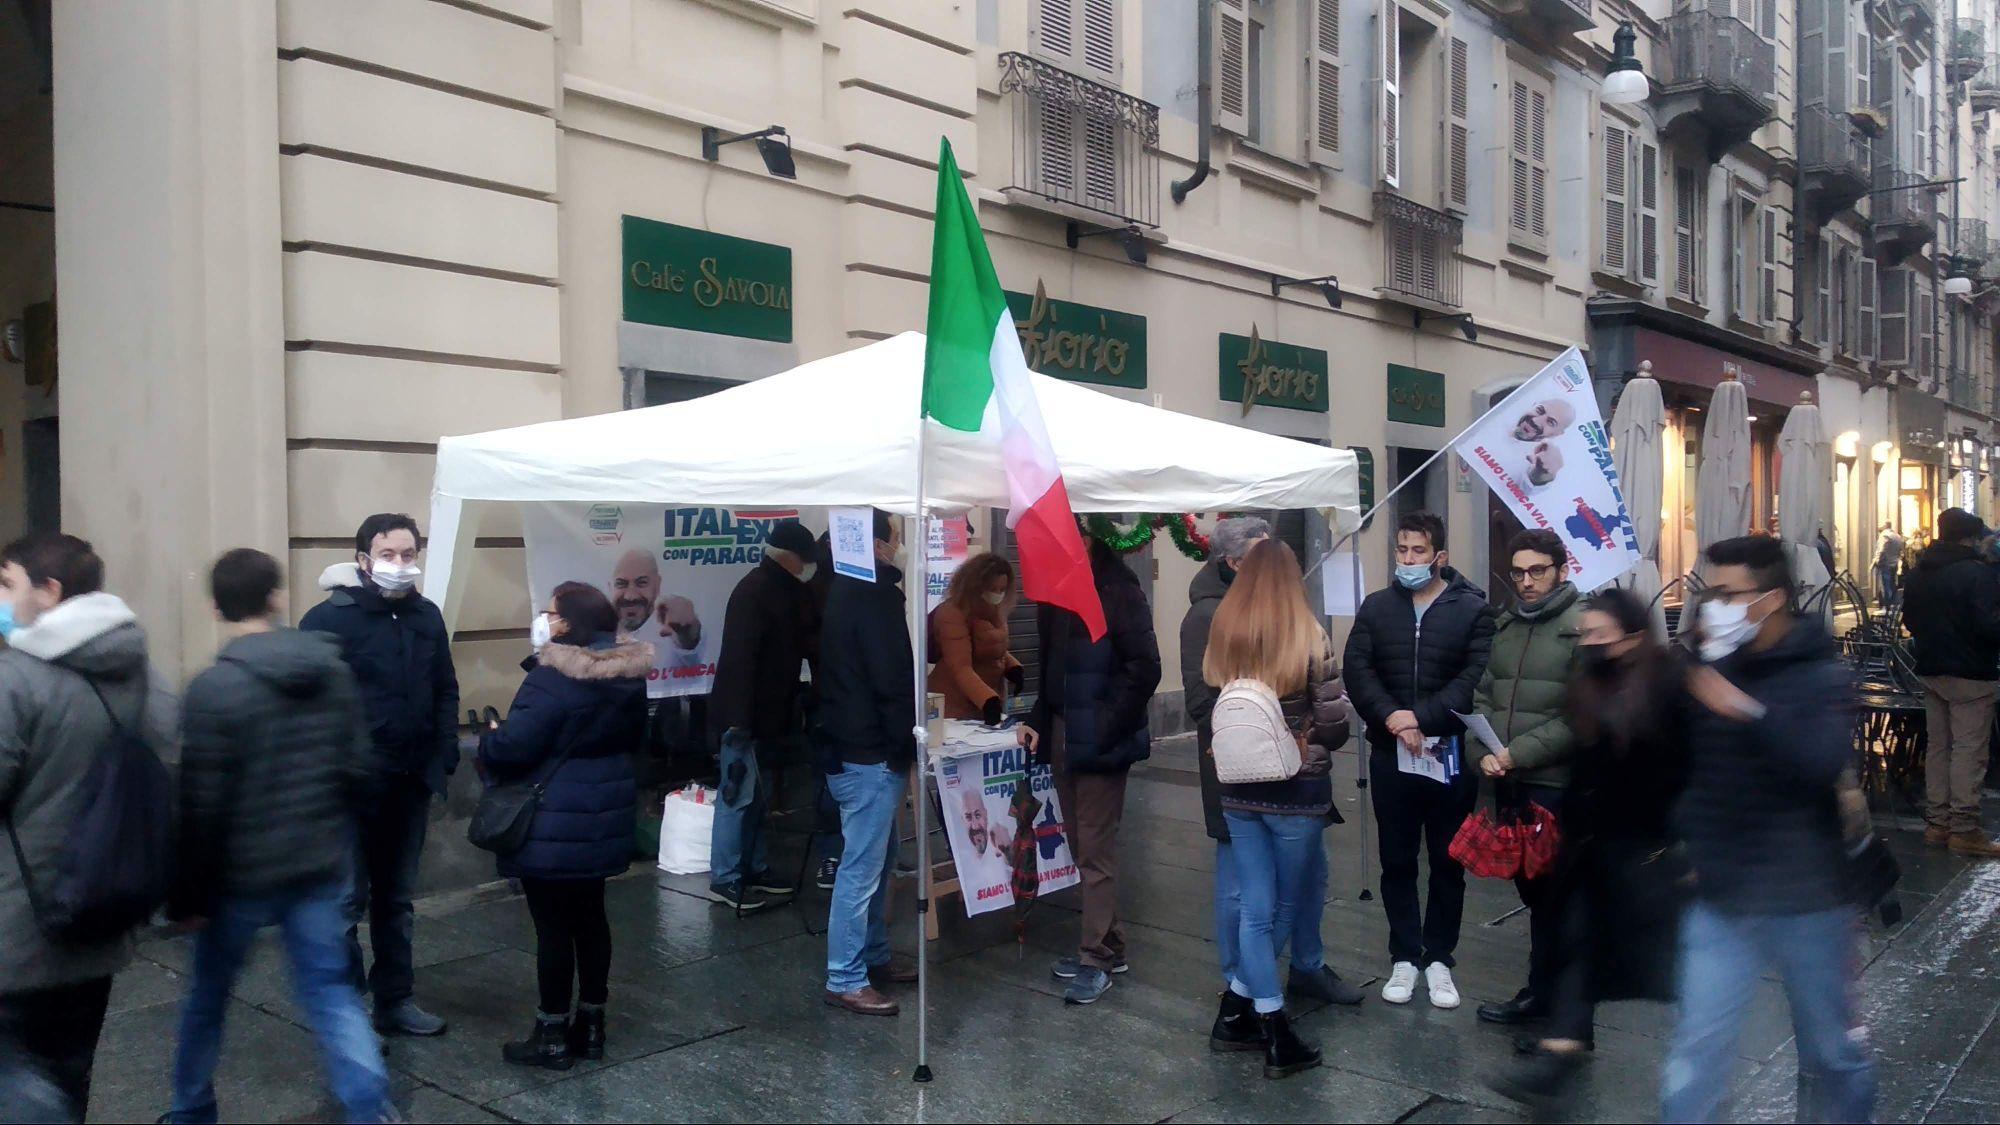 Gazebo informativo ITALEXIT CON PARAGONE